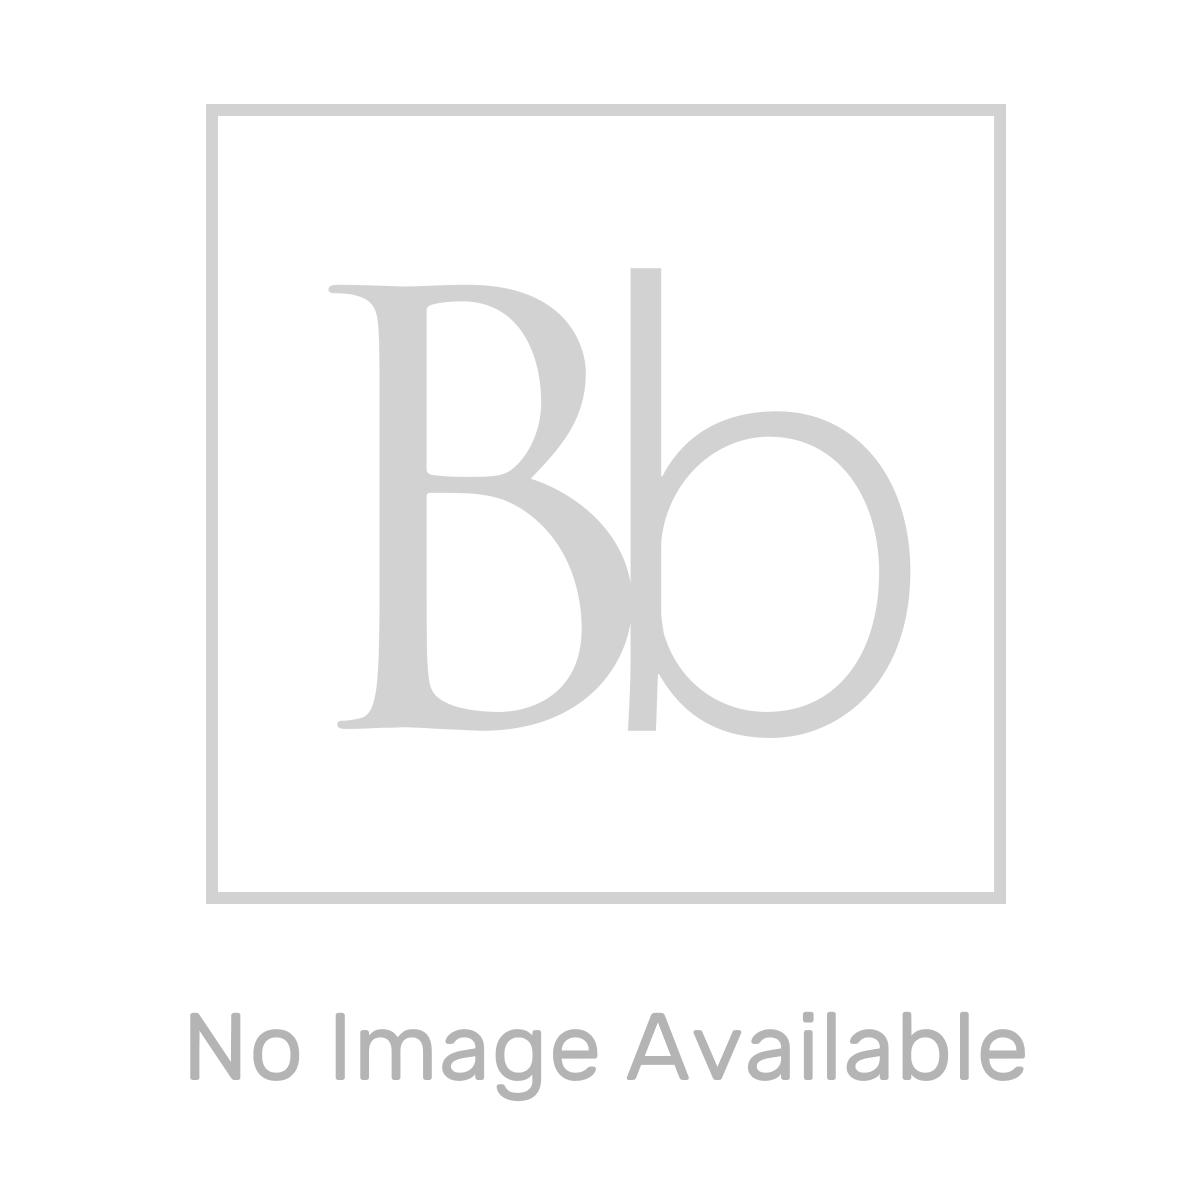 RAK Resort En-Suite with Corner Entry Shower Enclosure